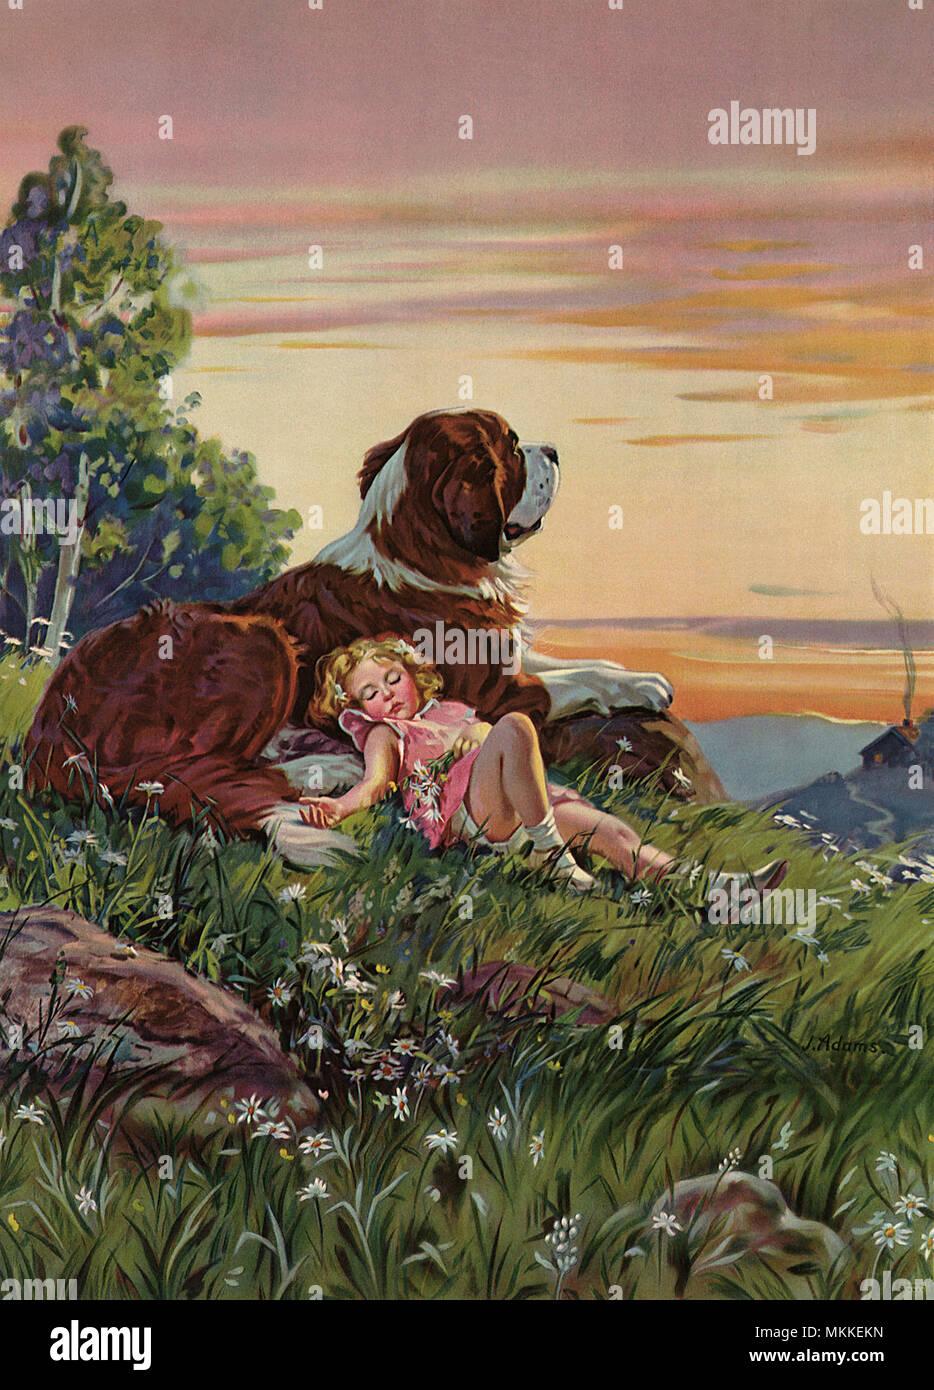 Girl Snoozes near Dog - Stock Image